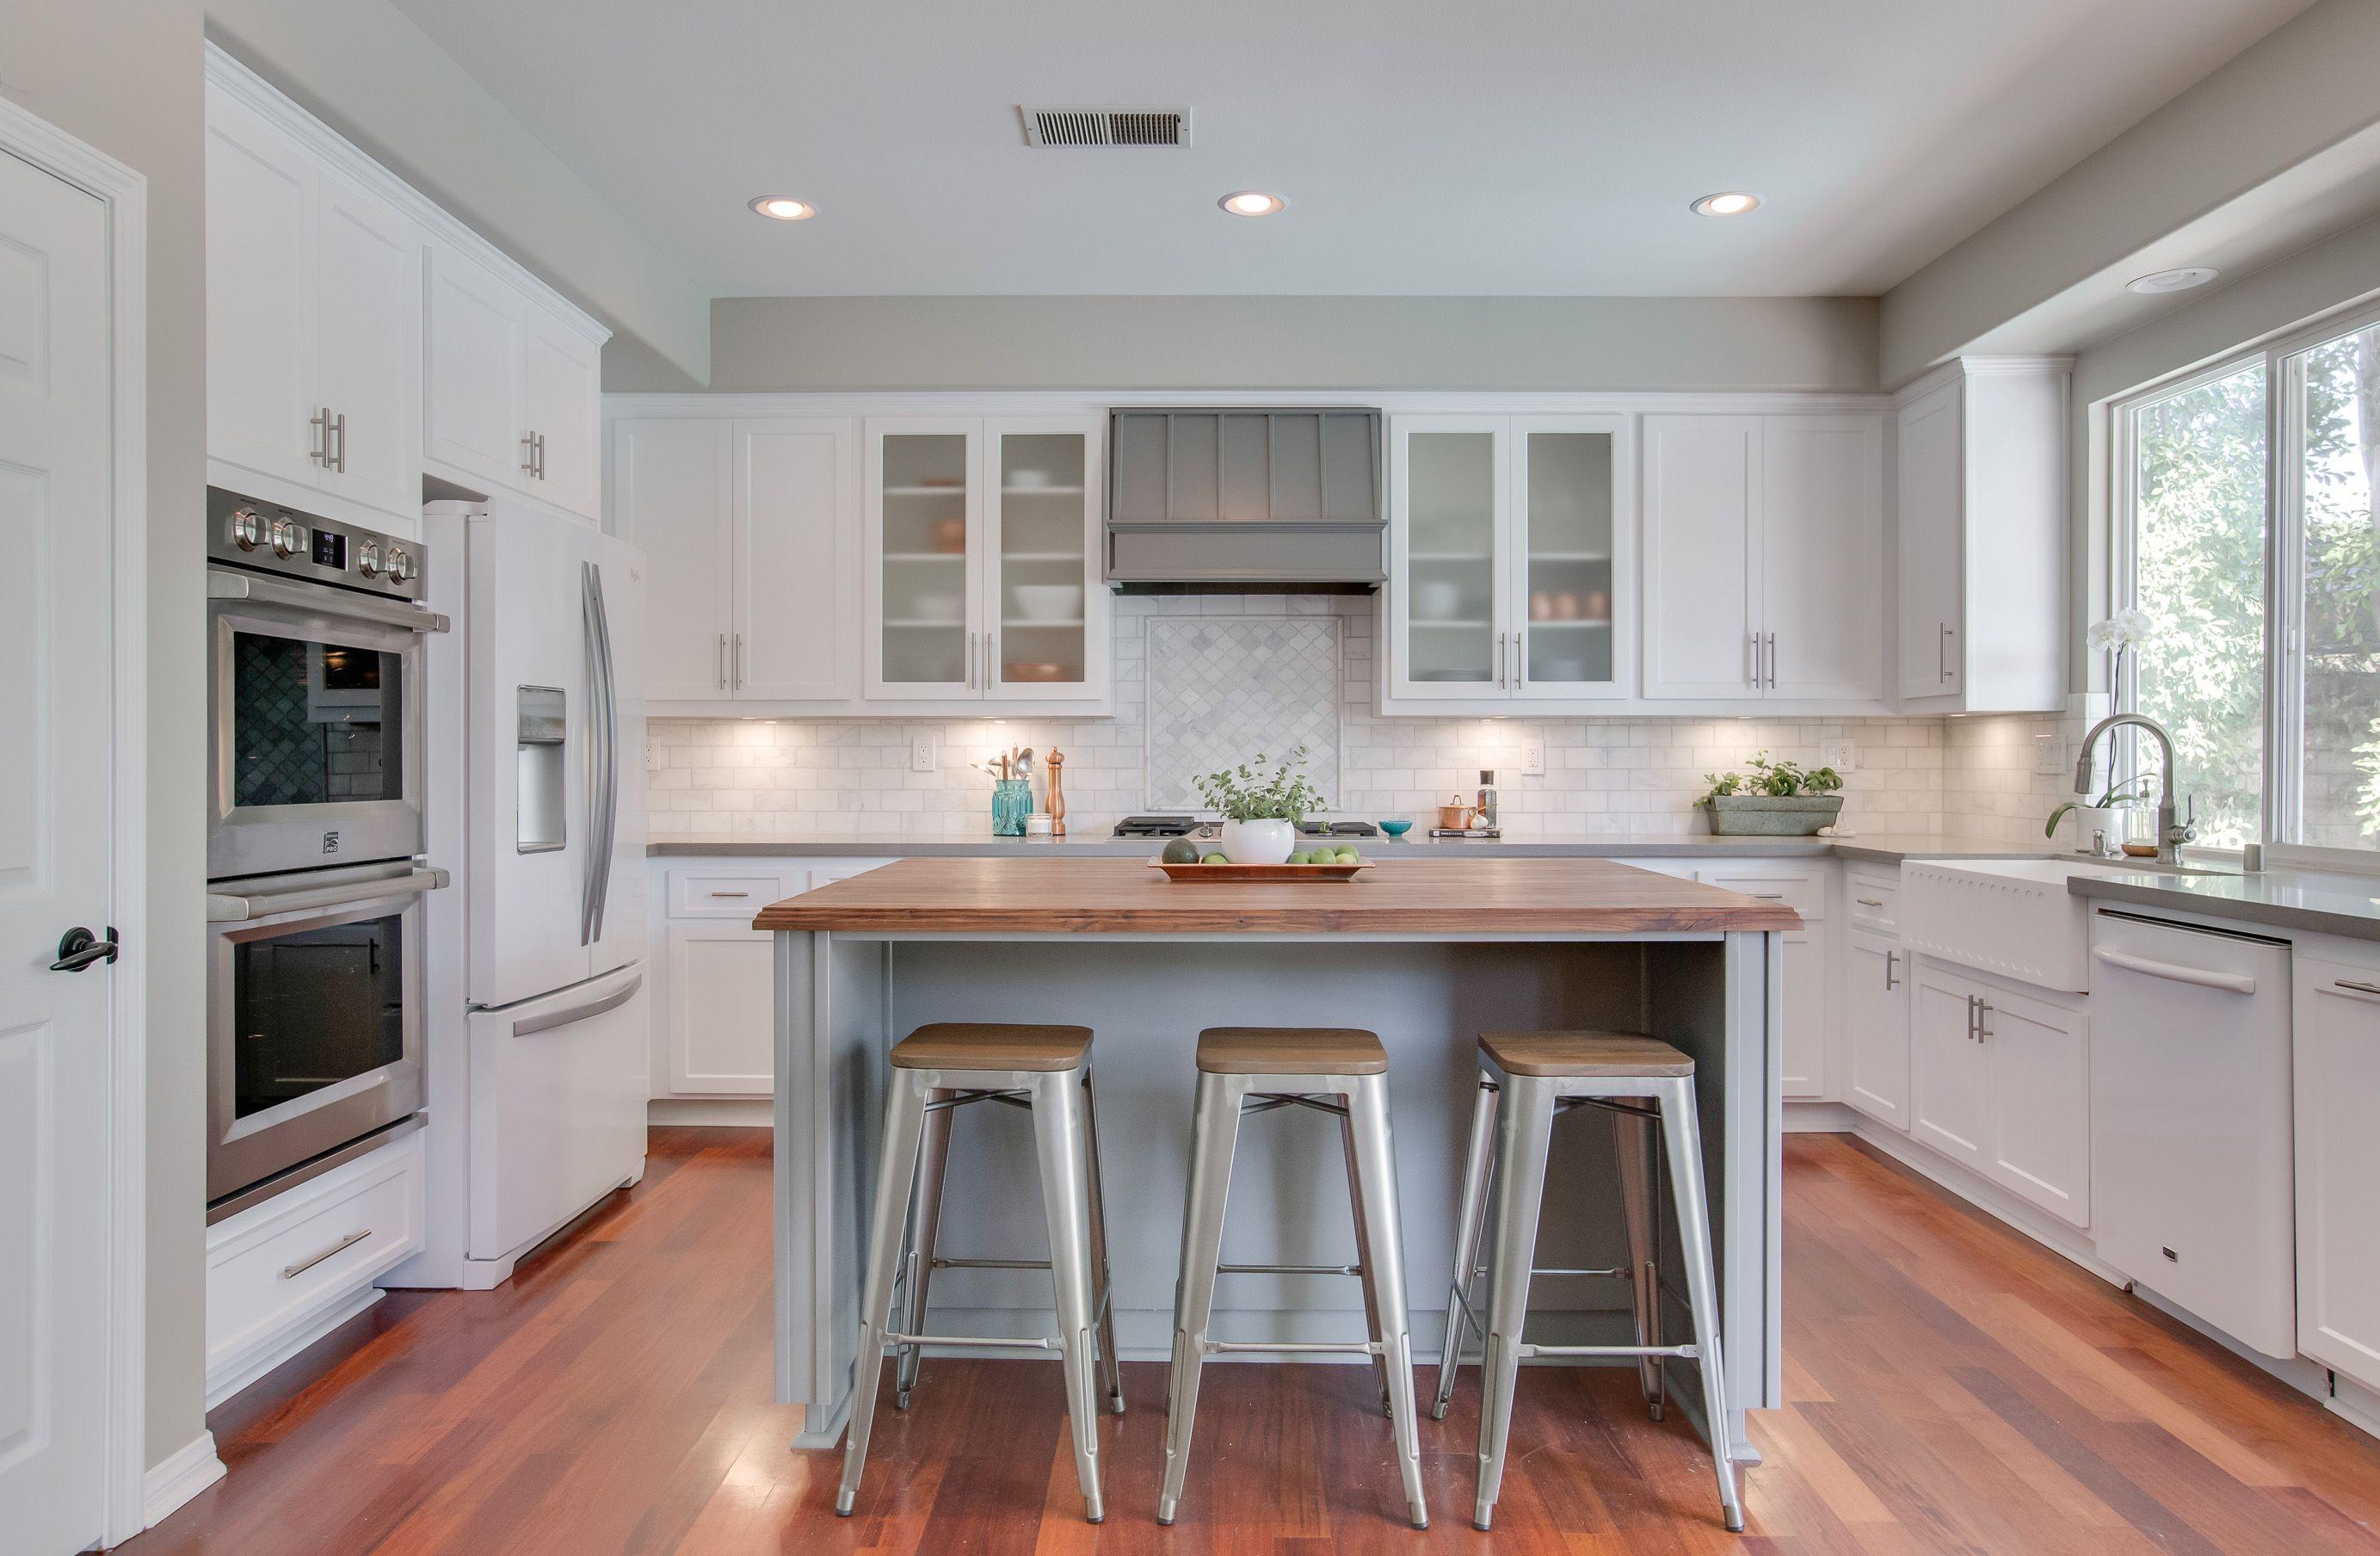 14+ Present Reborn Kitchen Cabinets - Interiors Magazine